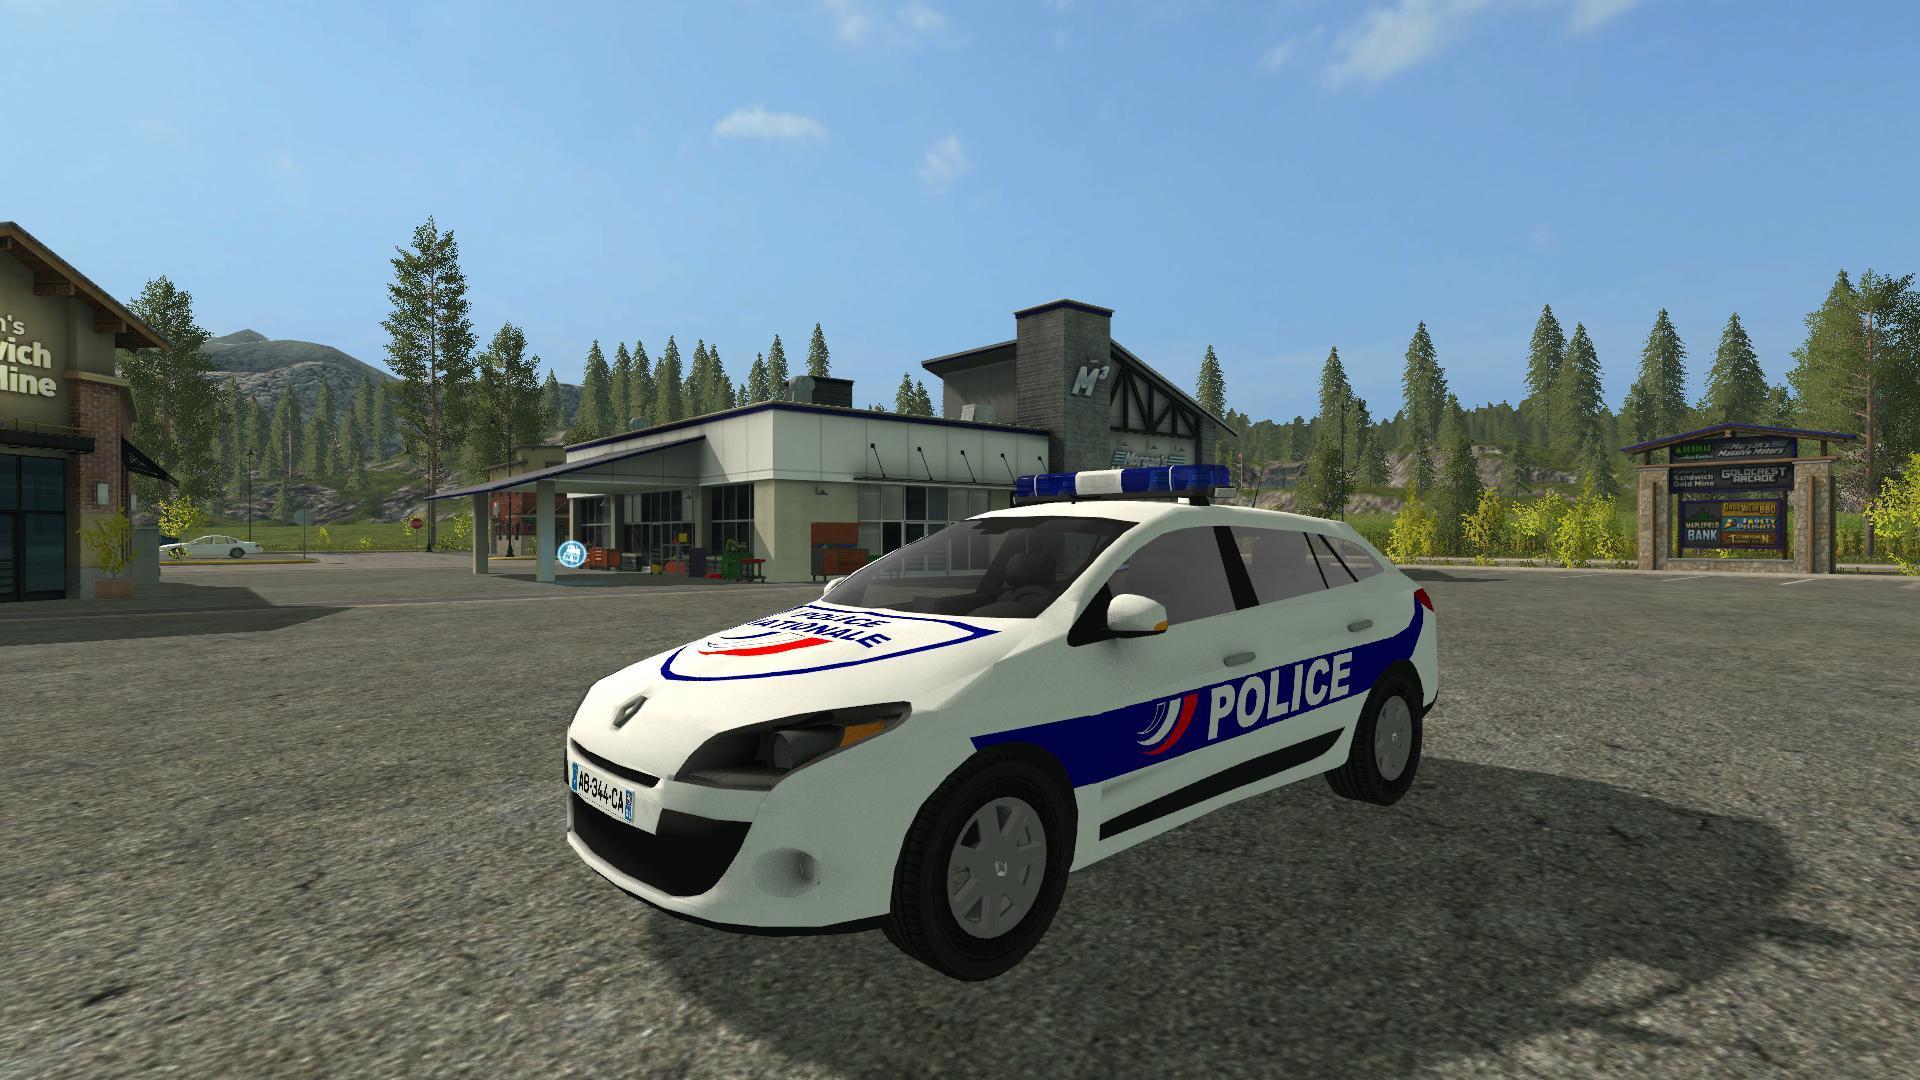 моды на фермер симулятор 2017 полиция